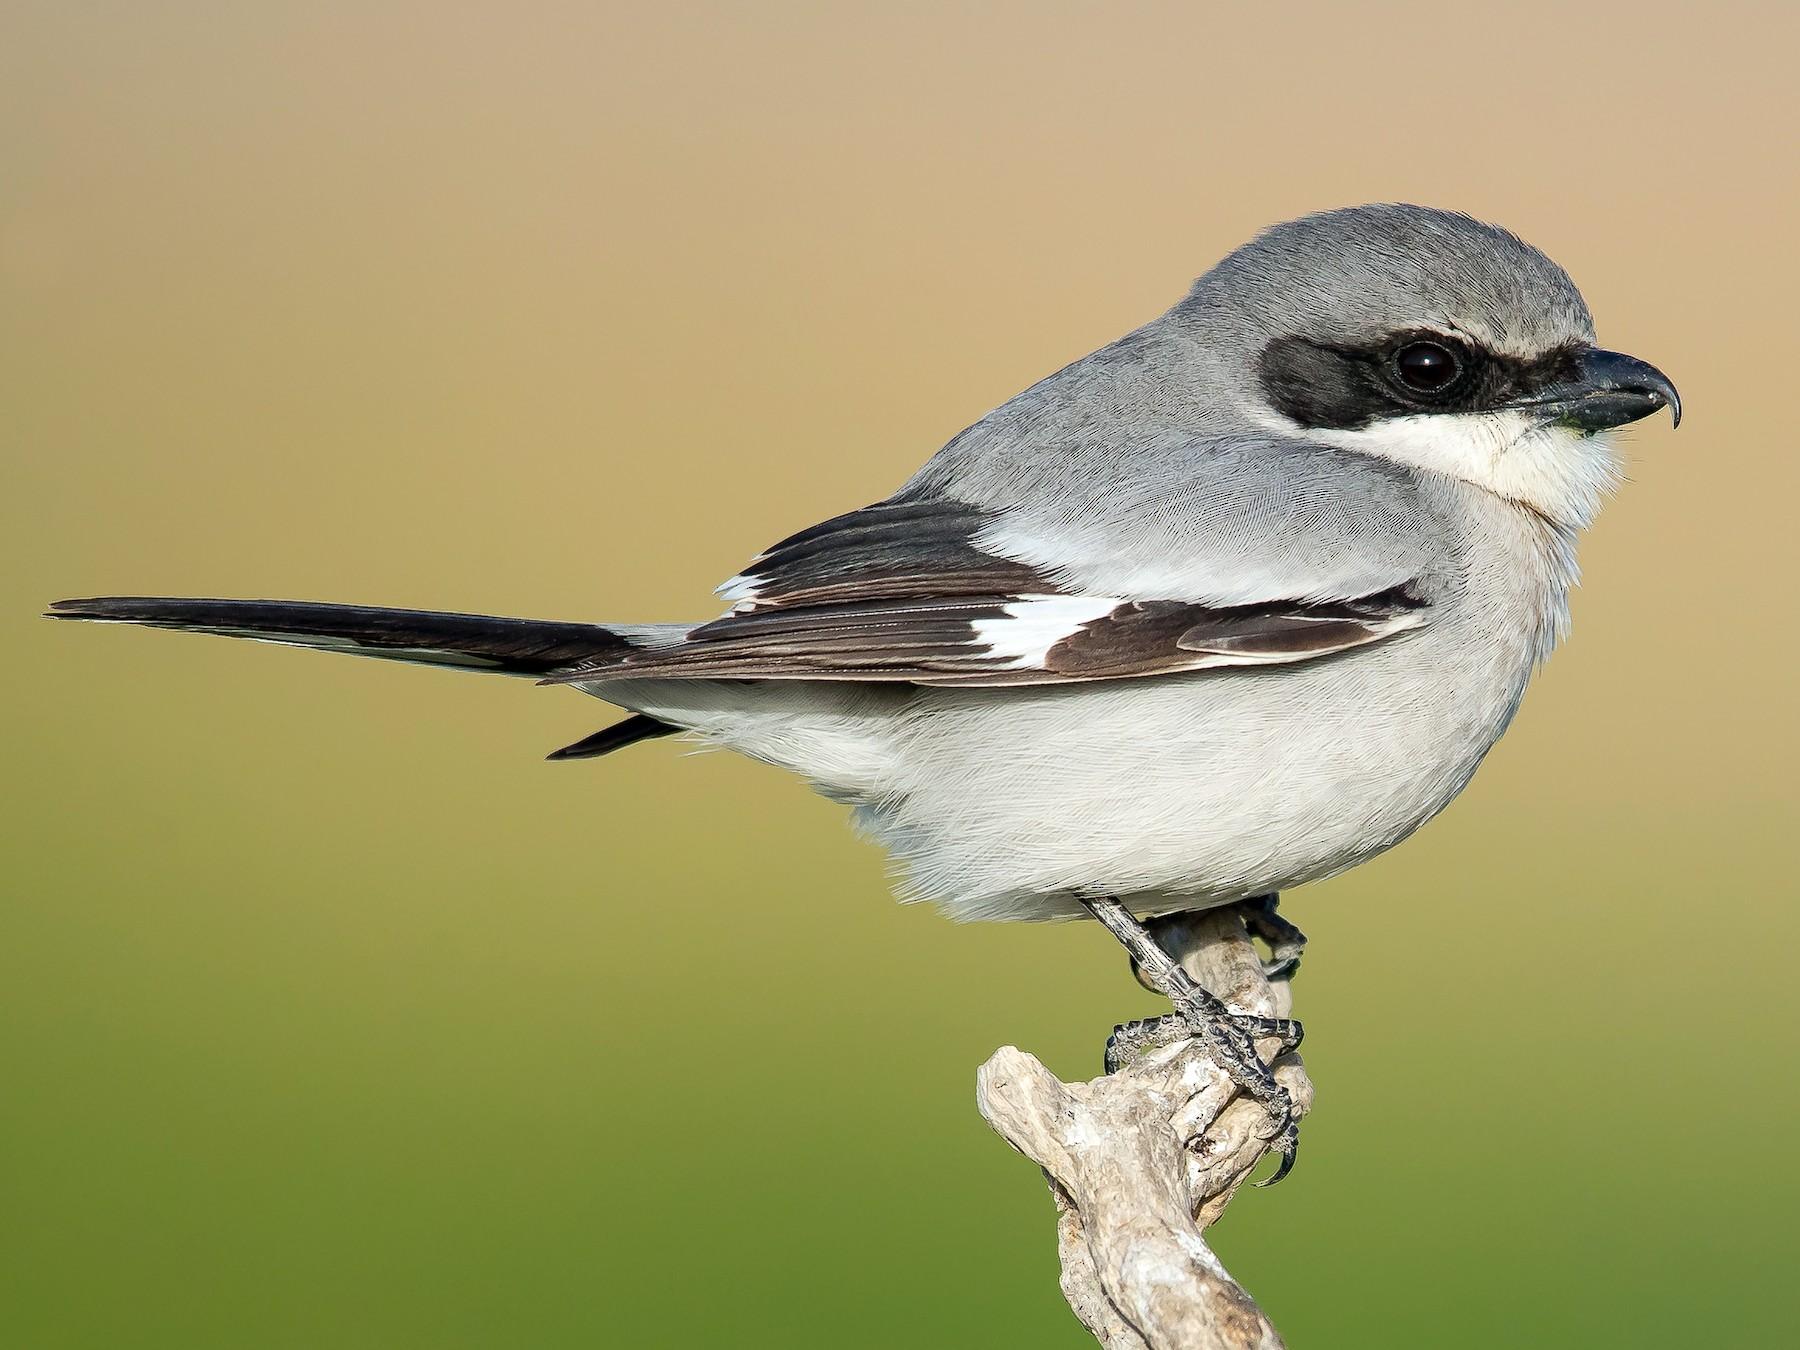 Loggerhead Shrike - Dorian Anderson